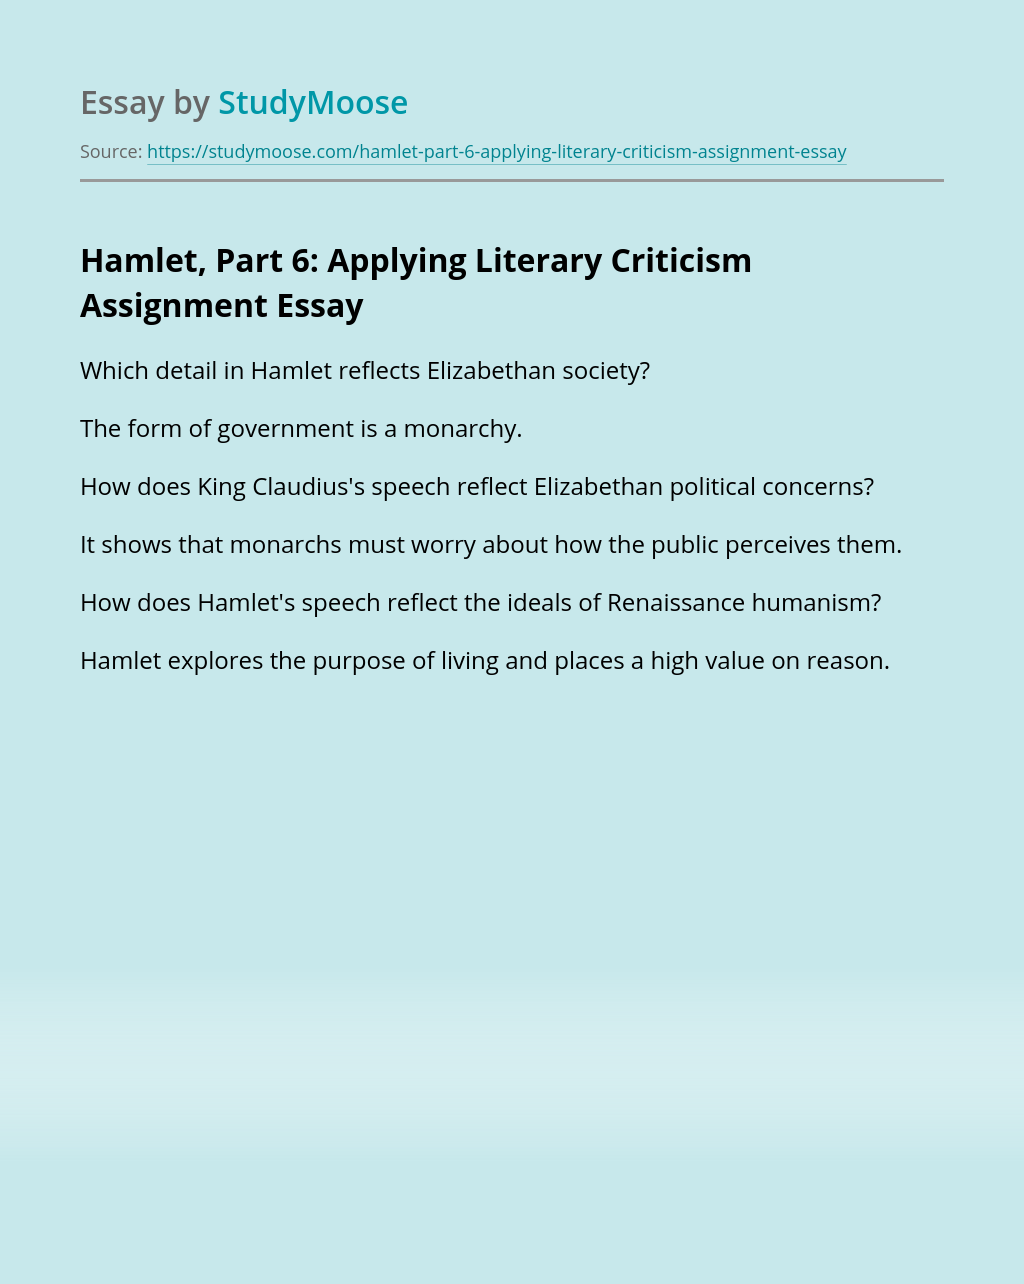 Hamlet, Part 6: Applying Literary Criticism Assignment